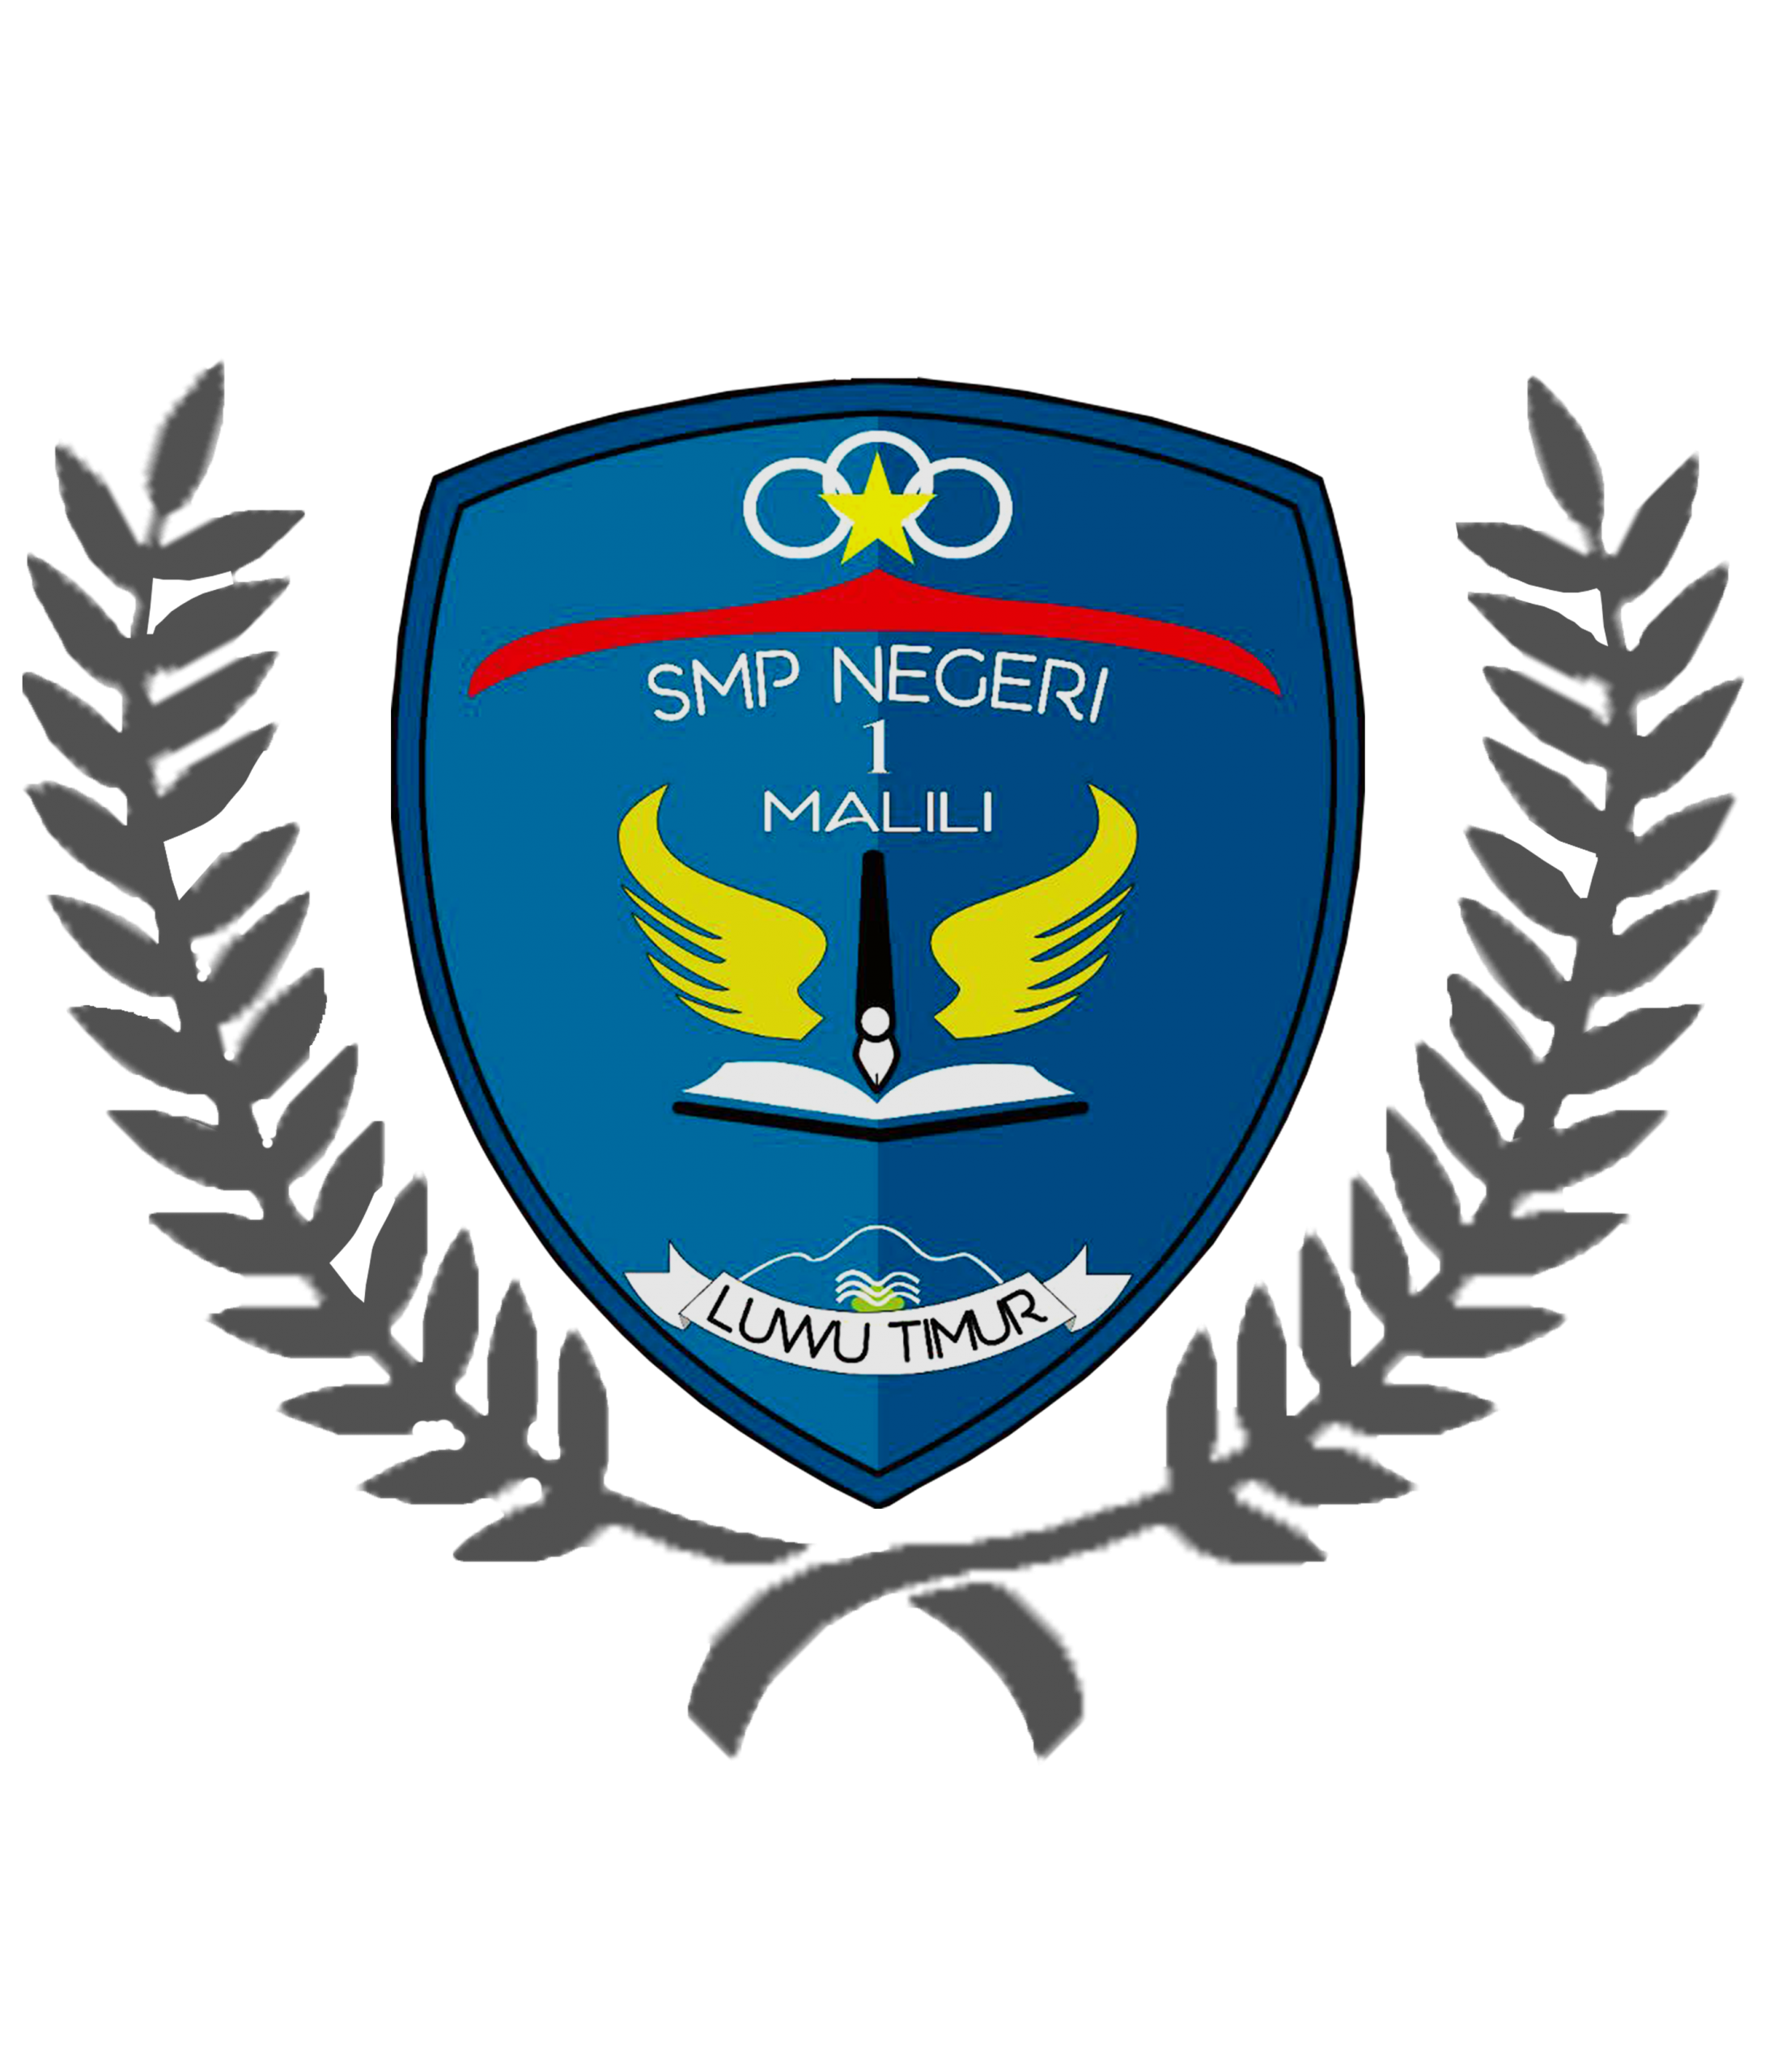 SMP Negeri 1 Malili